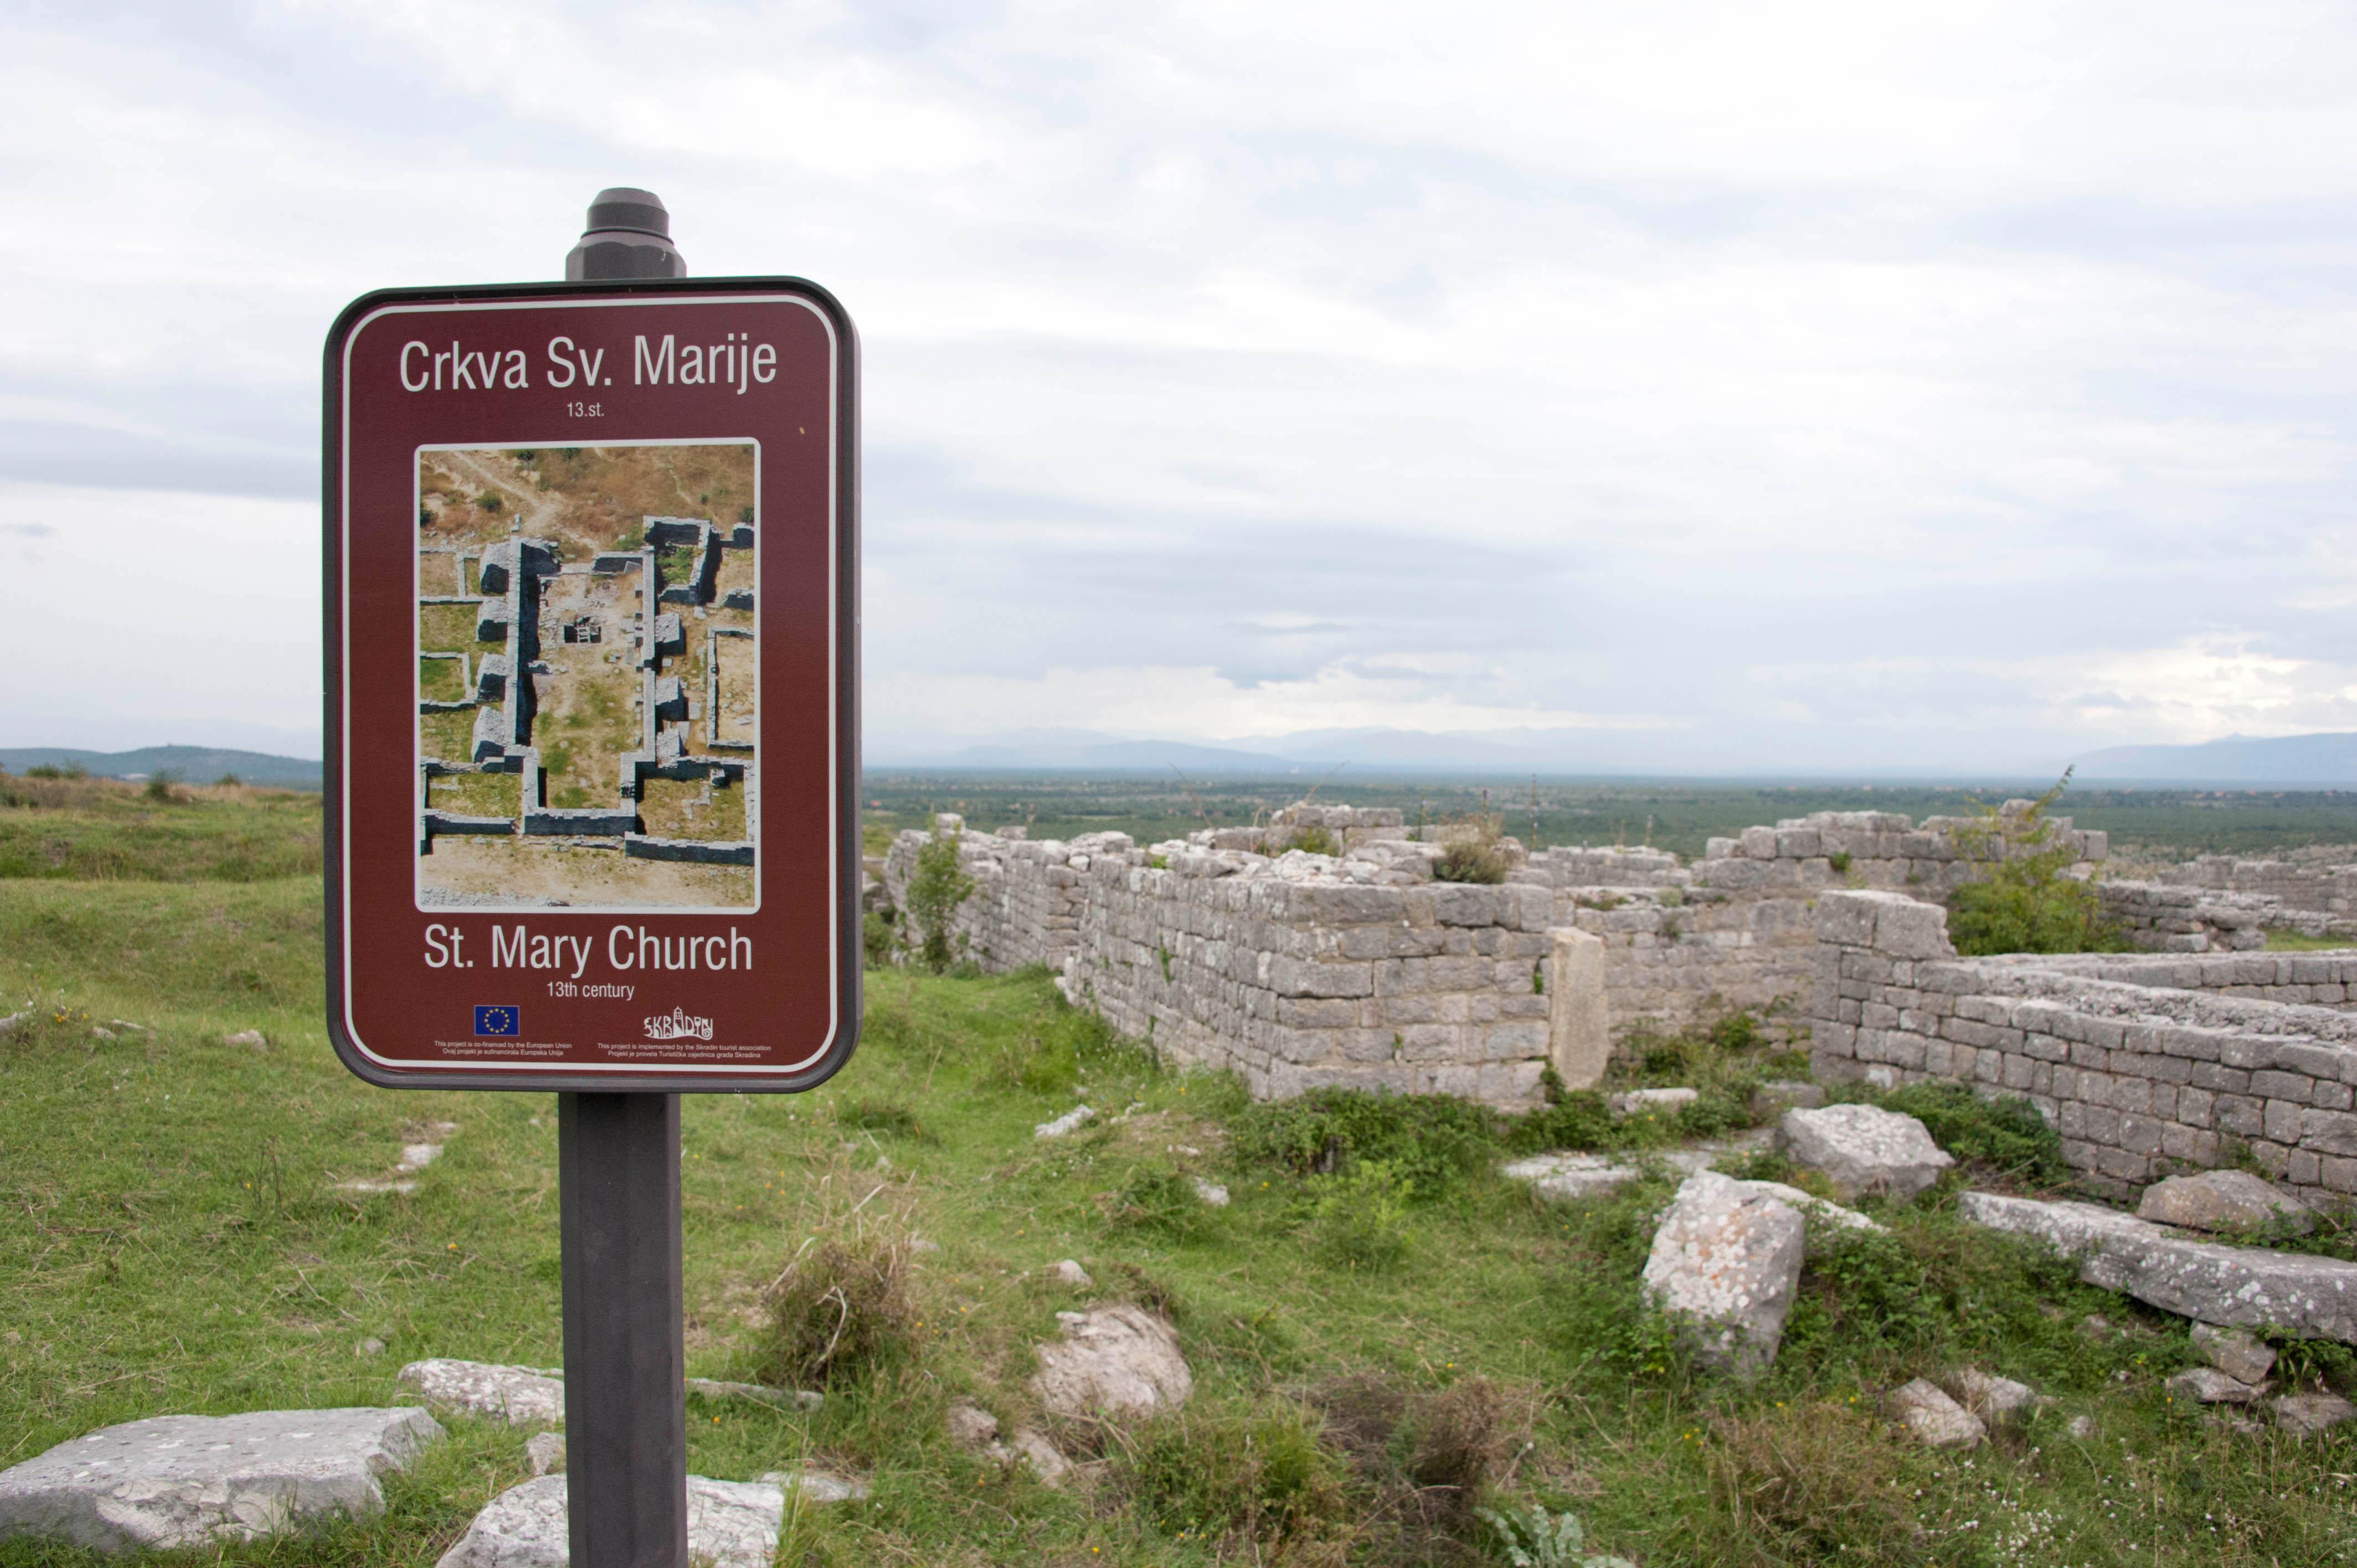 9552-Bribir-Parc national Krka (Dalmatie du Nord)